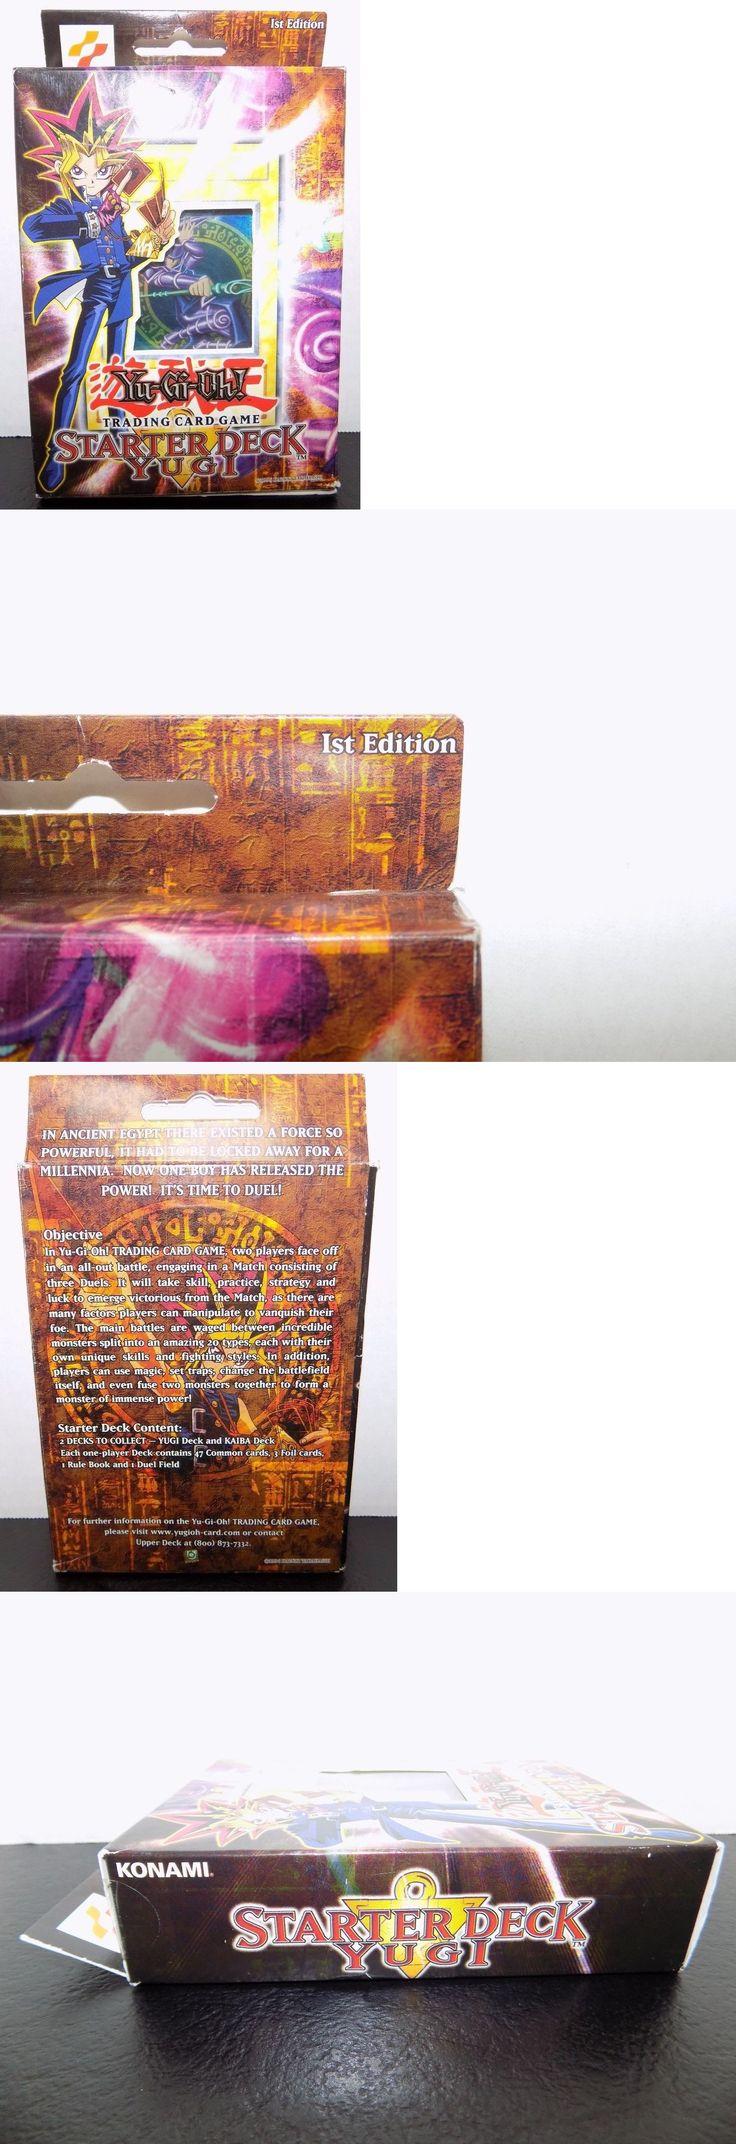 Yu-Gi-Oh Sealed Decks and Kits 183452: Starter Deck Yugi Sdy 1St English Edition Original Yugioh Deck New Sealed -> BUY IT NOW ONLY: $305.99 on eBay!